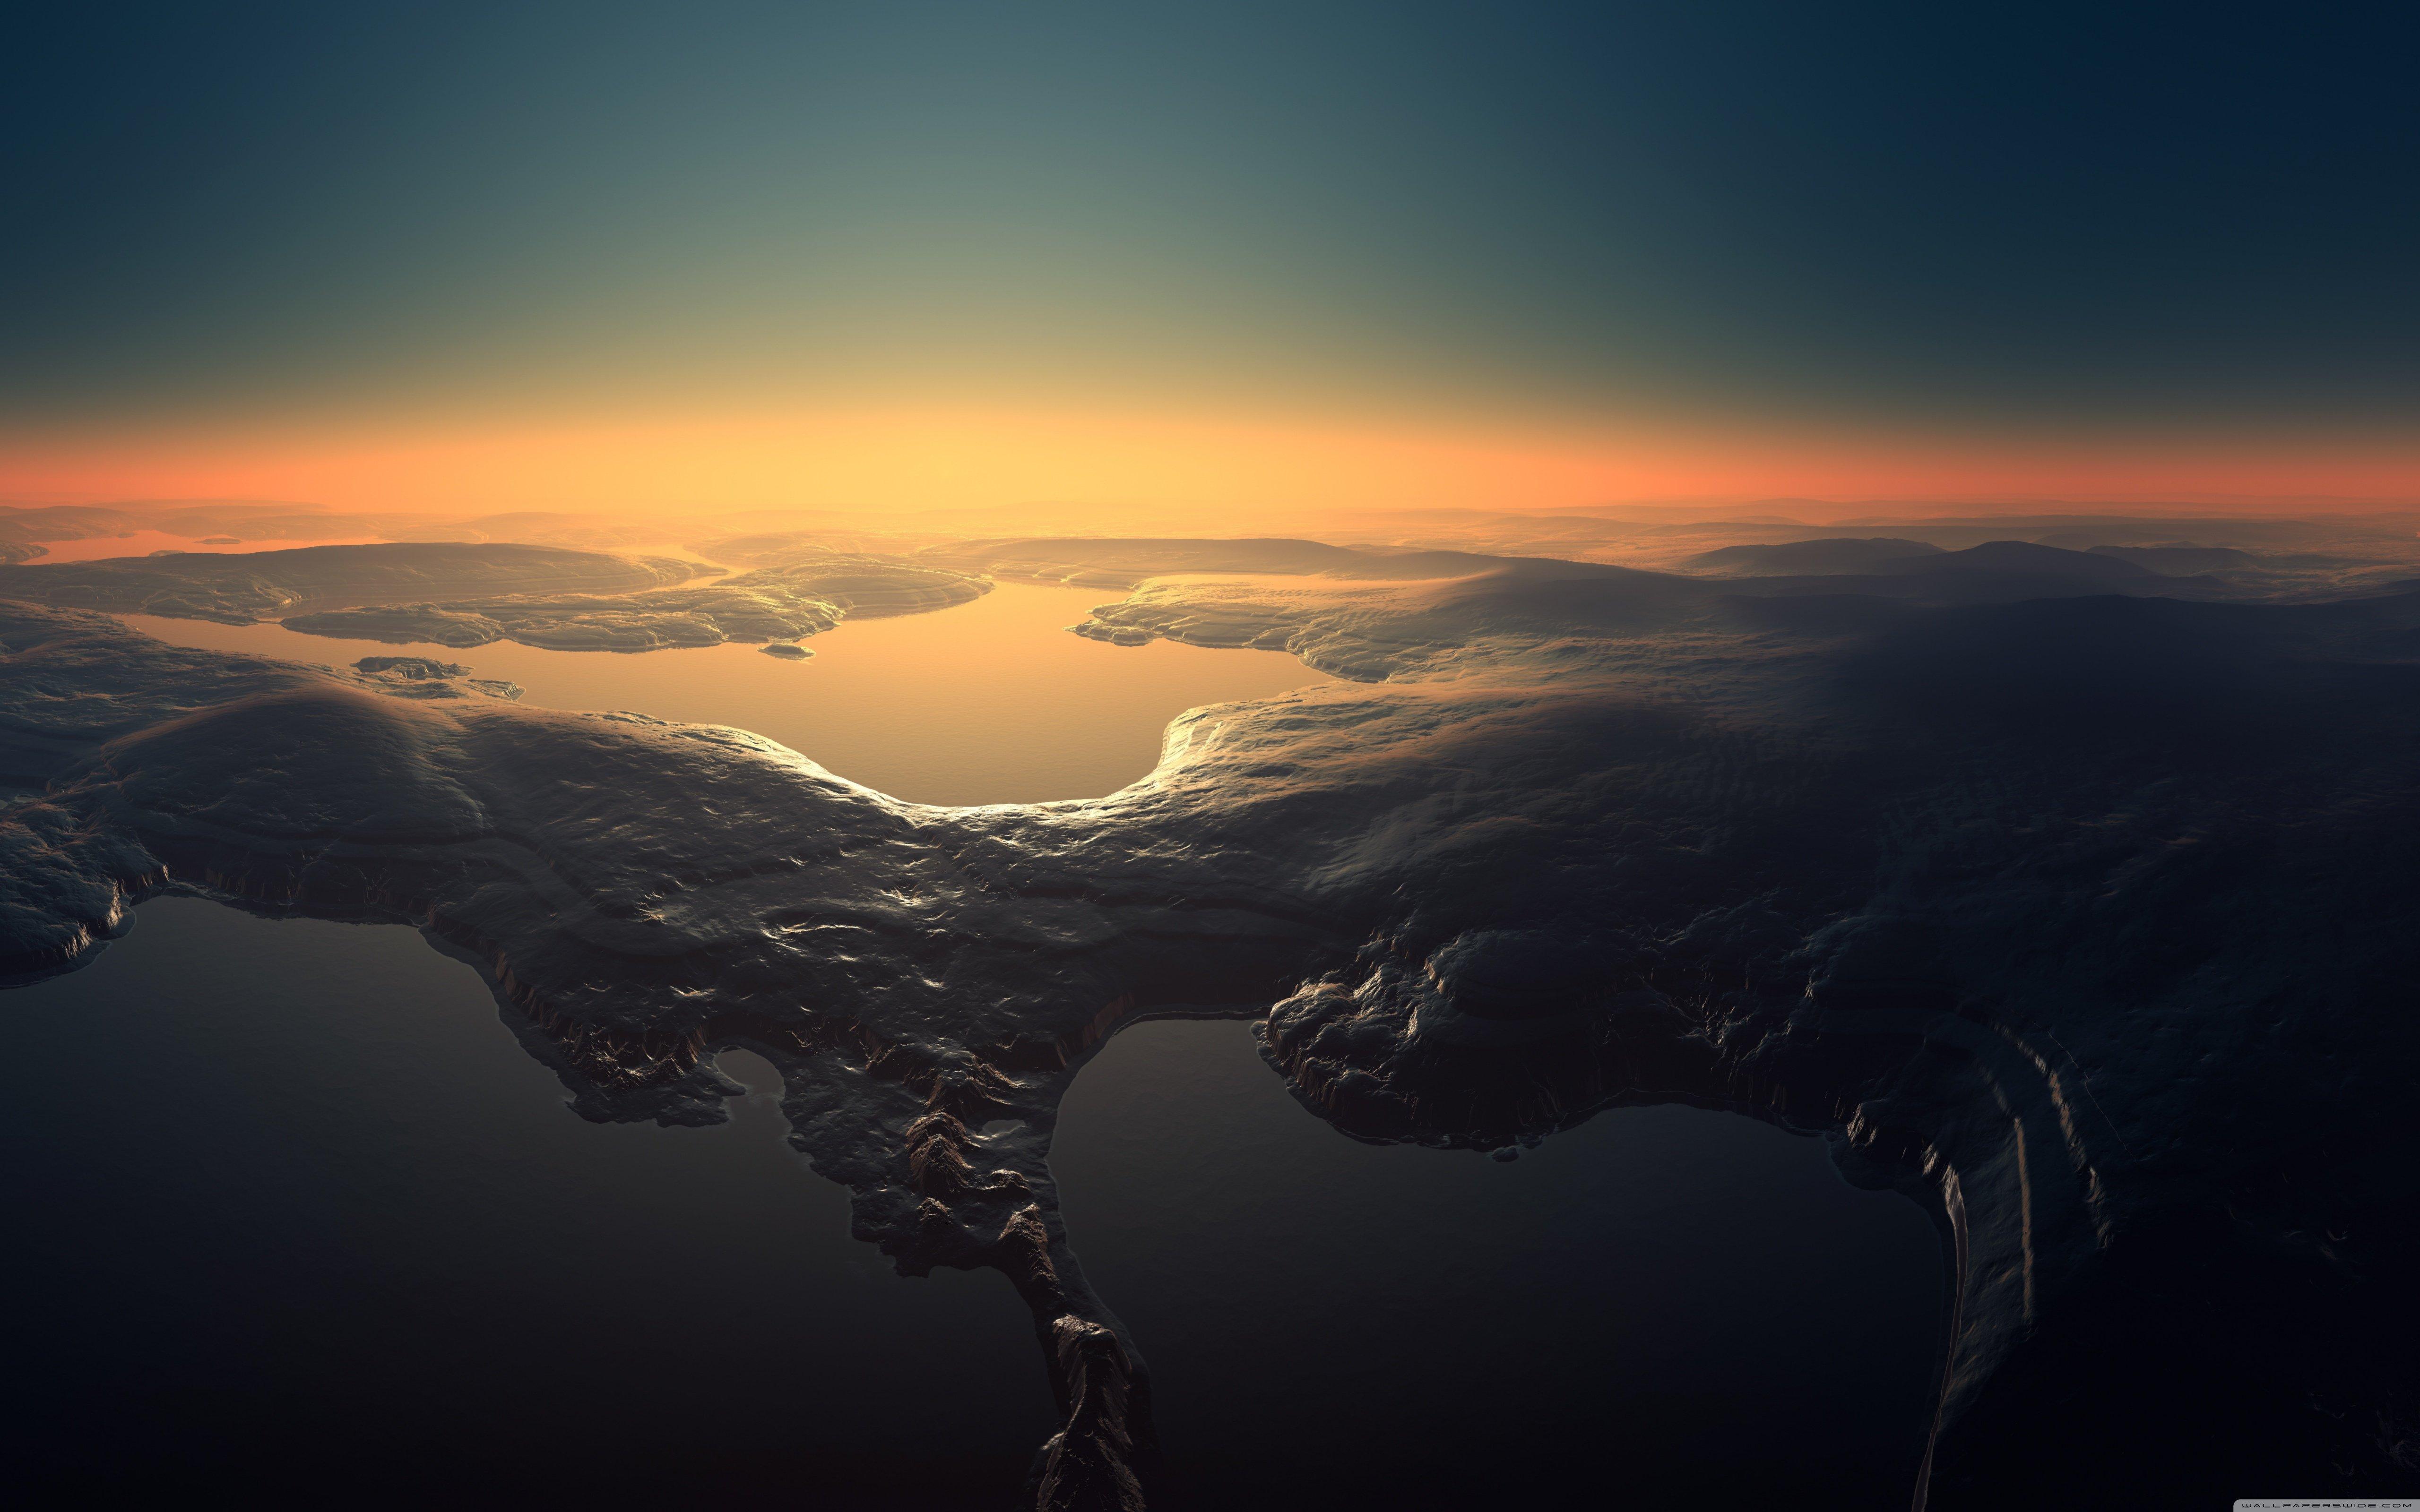 Aerial View-wallpaper-5120x3200 Wallpaper